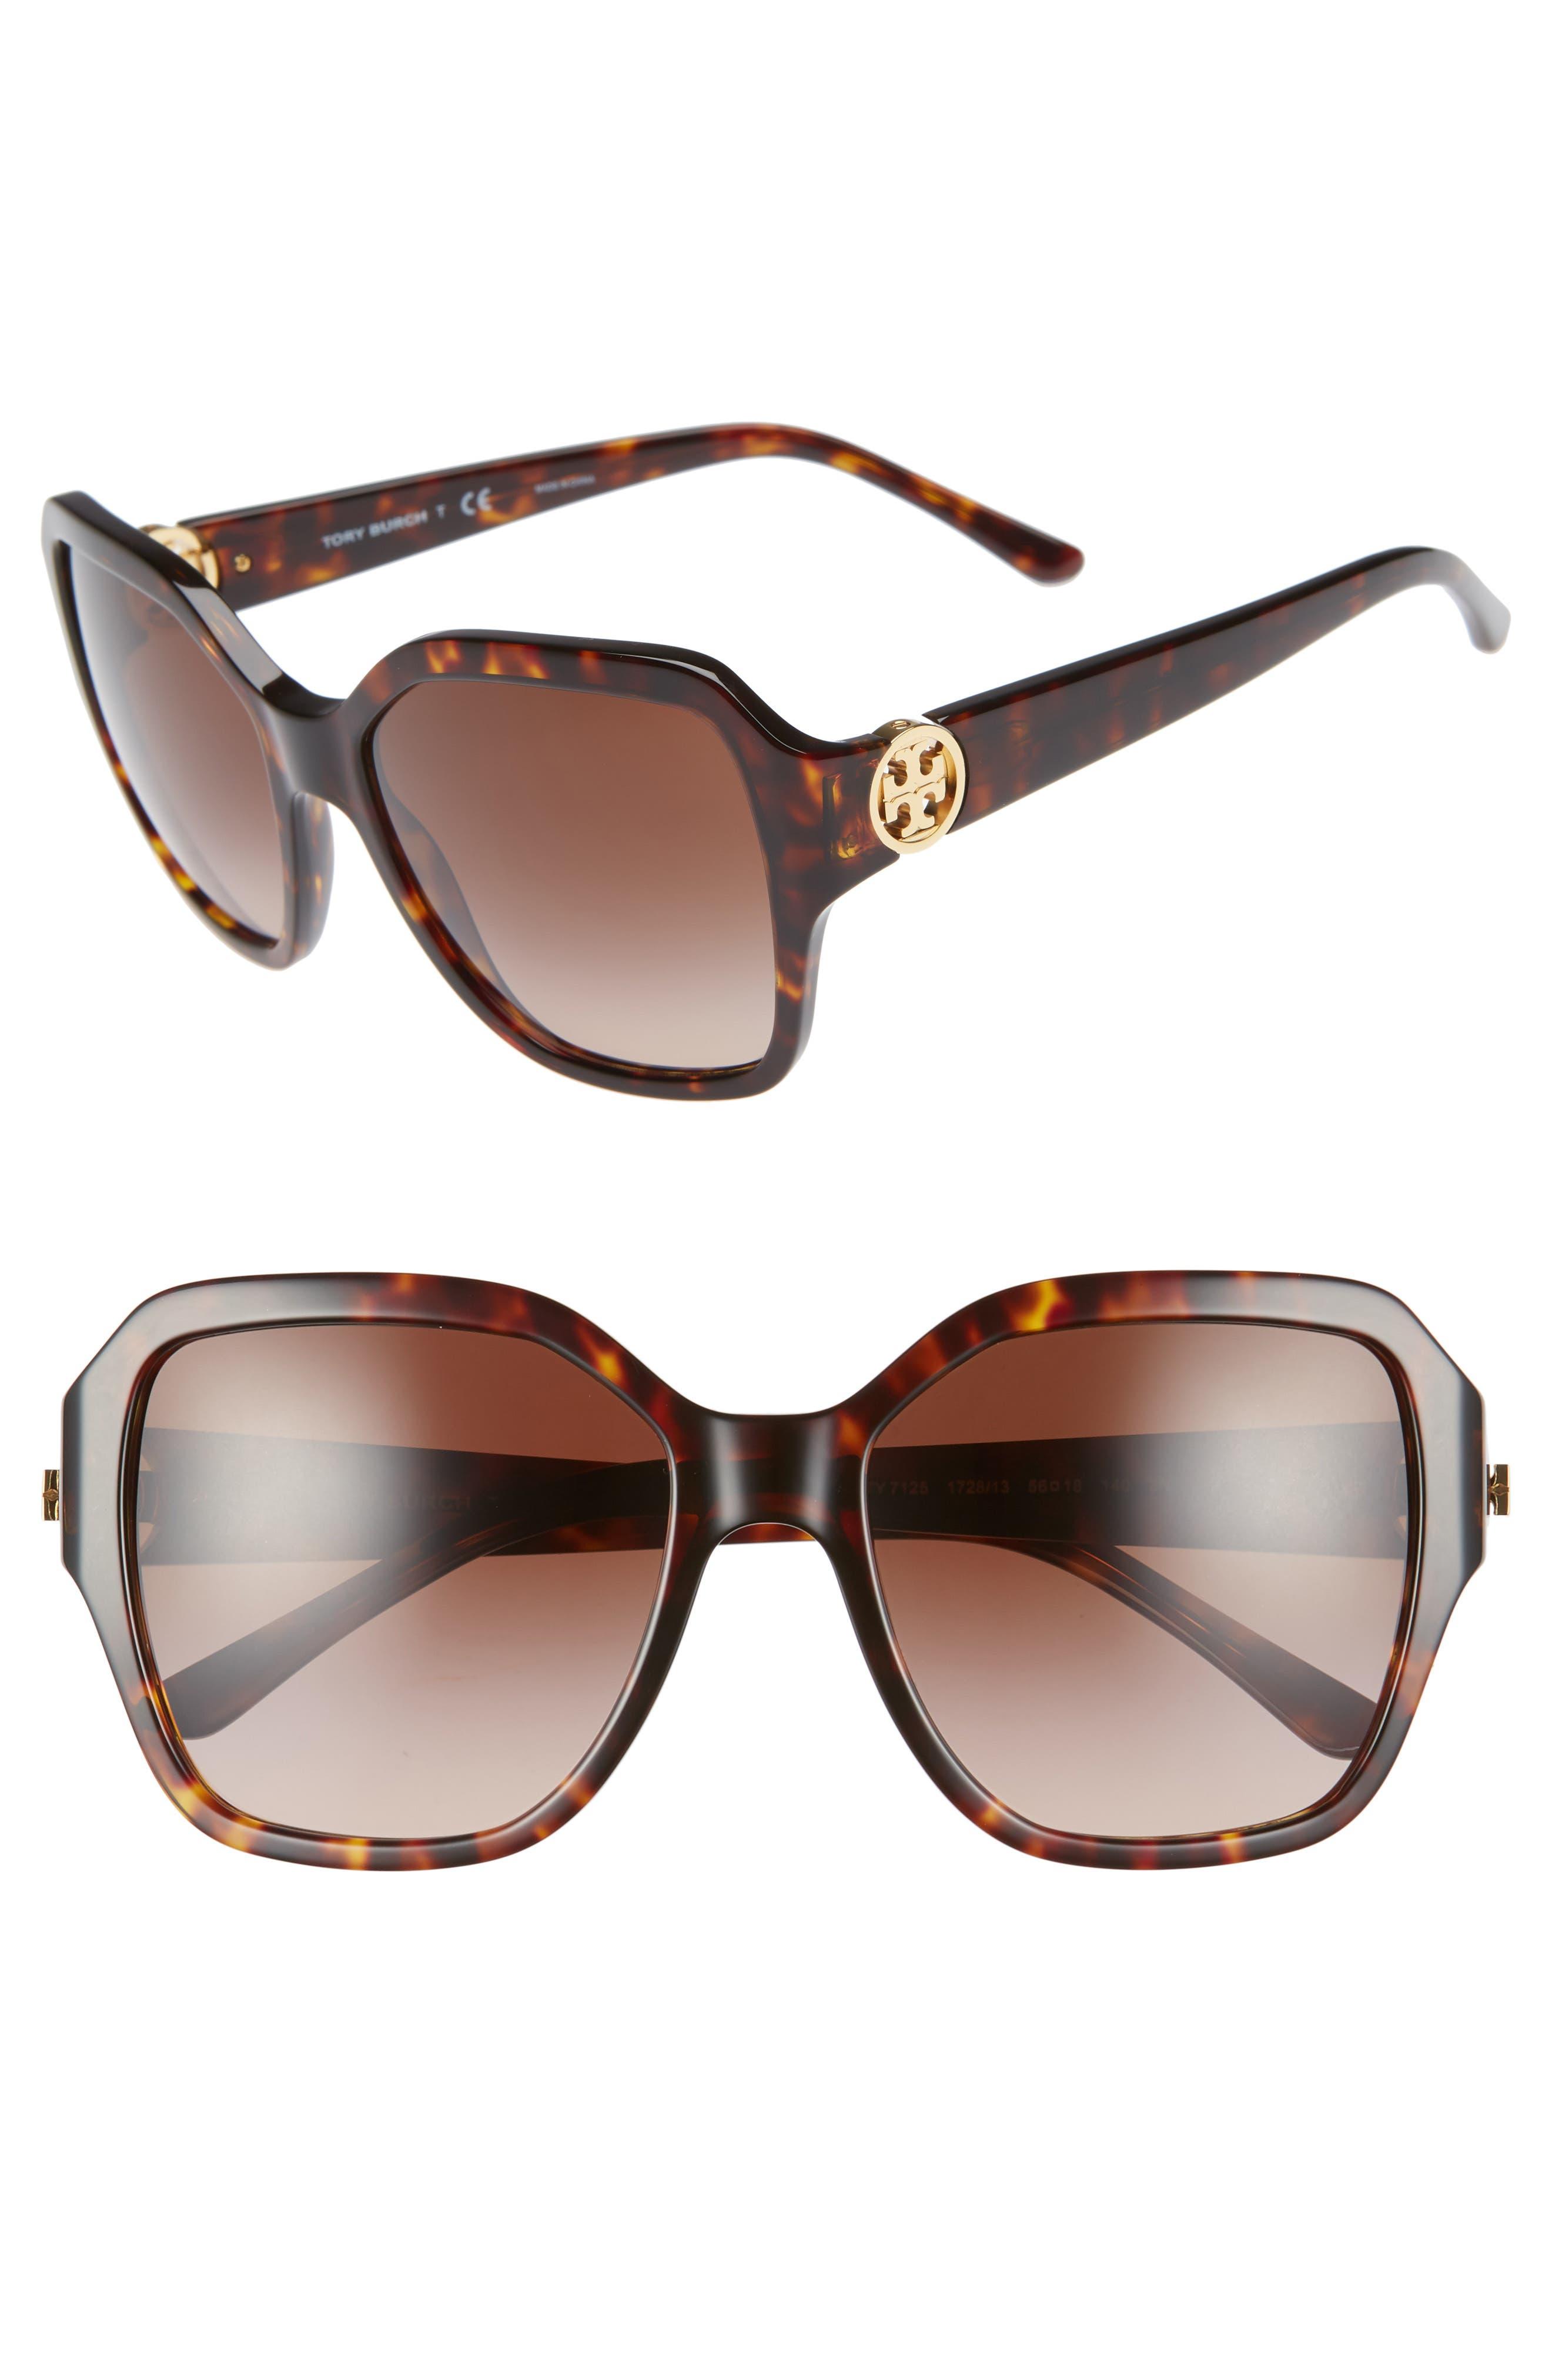 TORY BURCH Reva 56mm Square Sunglasses, Main, color, DARK TORTOISE GRADIENT